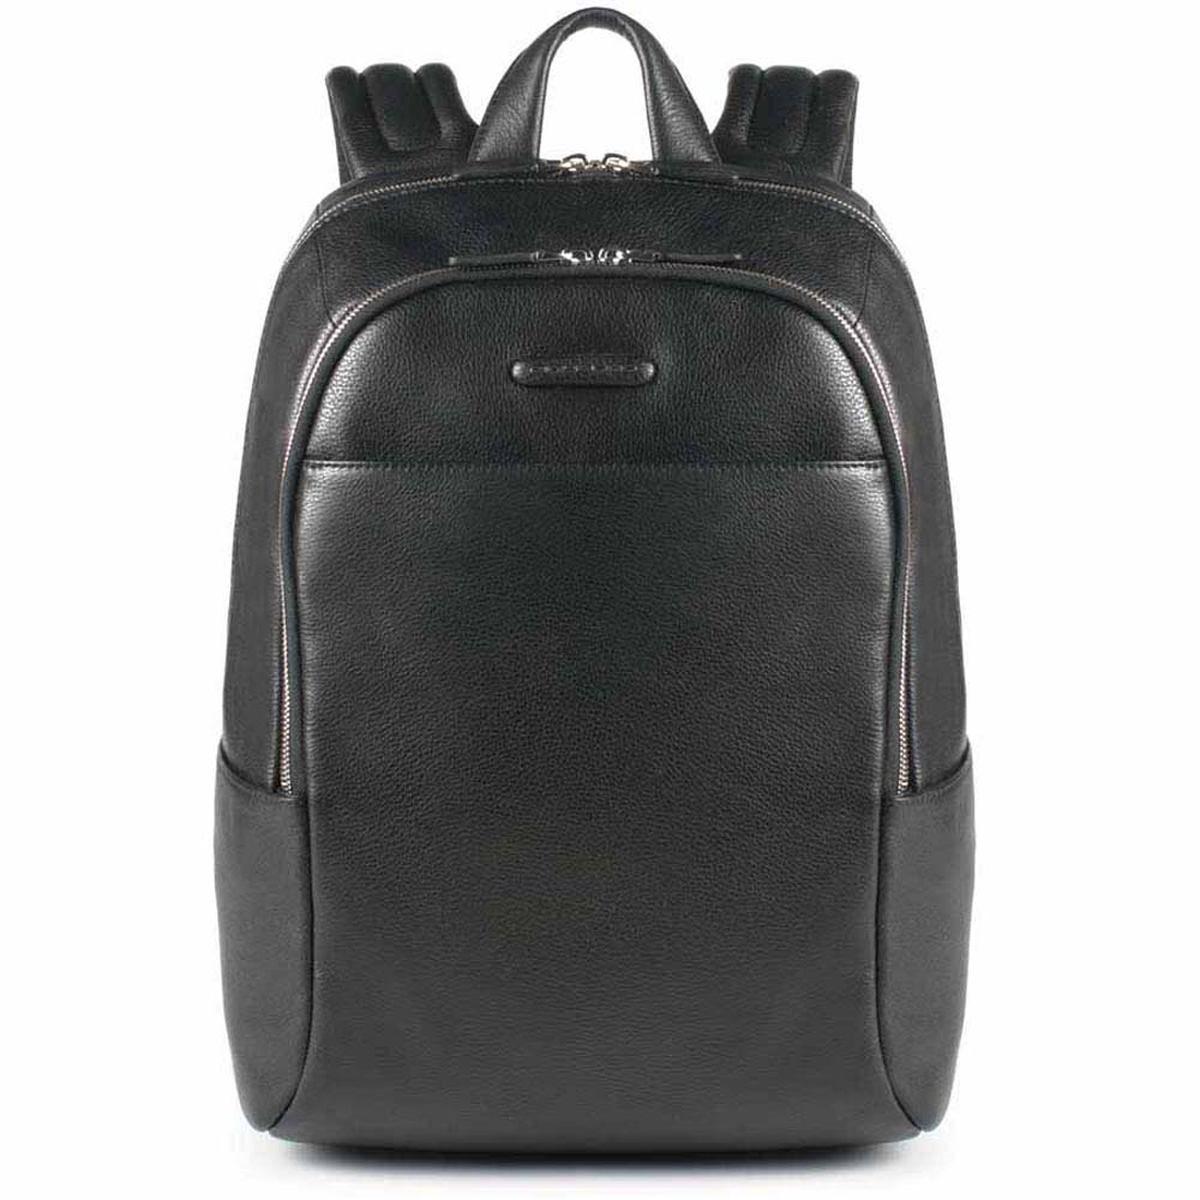 Piquadro Τσάντα πλάτης δερμάτινη 40x30x14cm με θέση PC 14   σειρά Modus Black